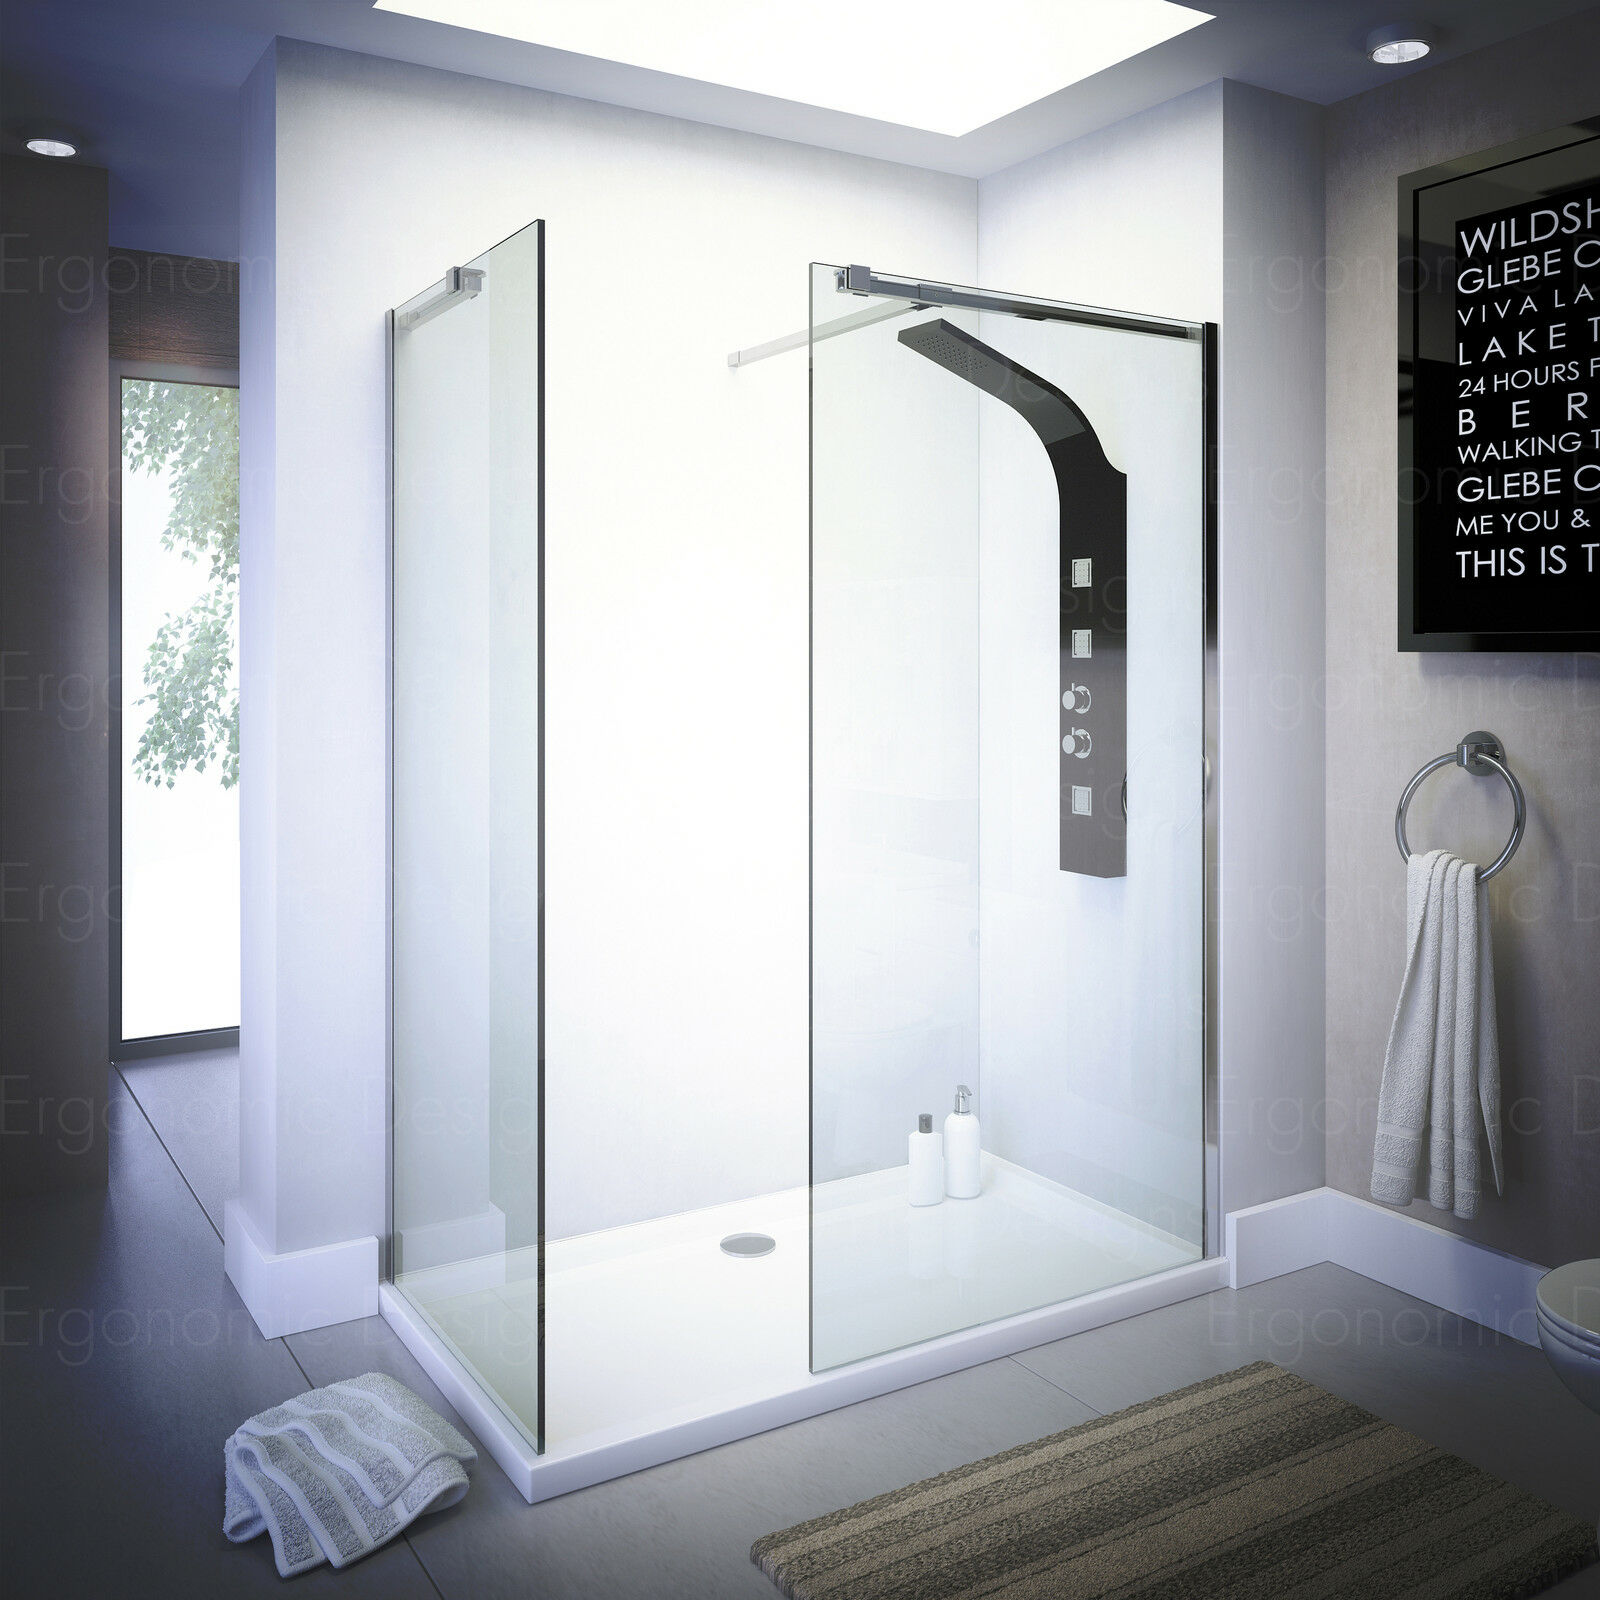 Walk In Shower Enclosure 500mm Walk In Shower Enclosure Wet Room Easyclean 10mm Glass Tall